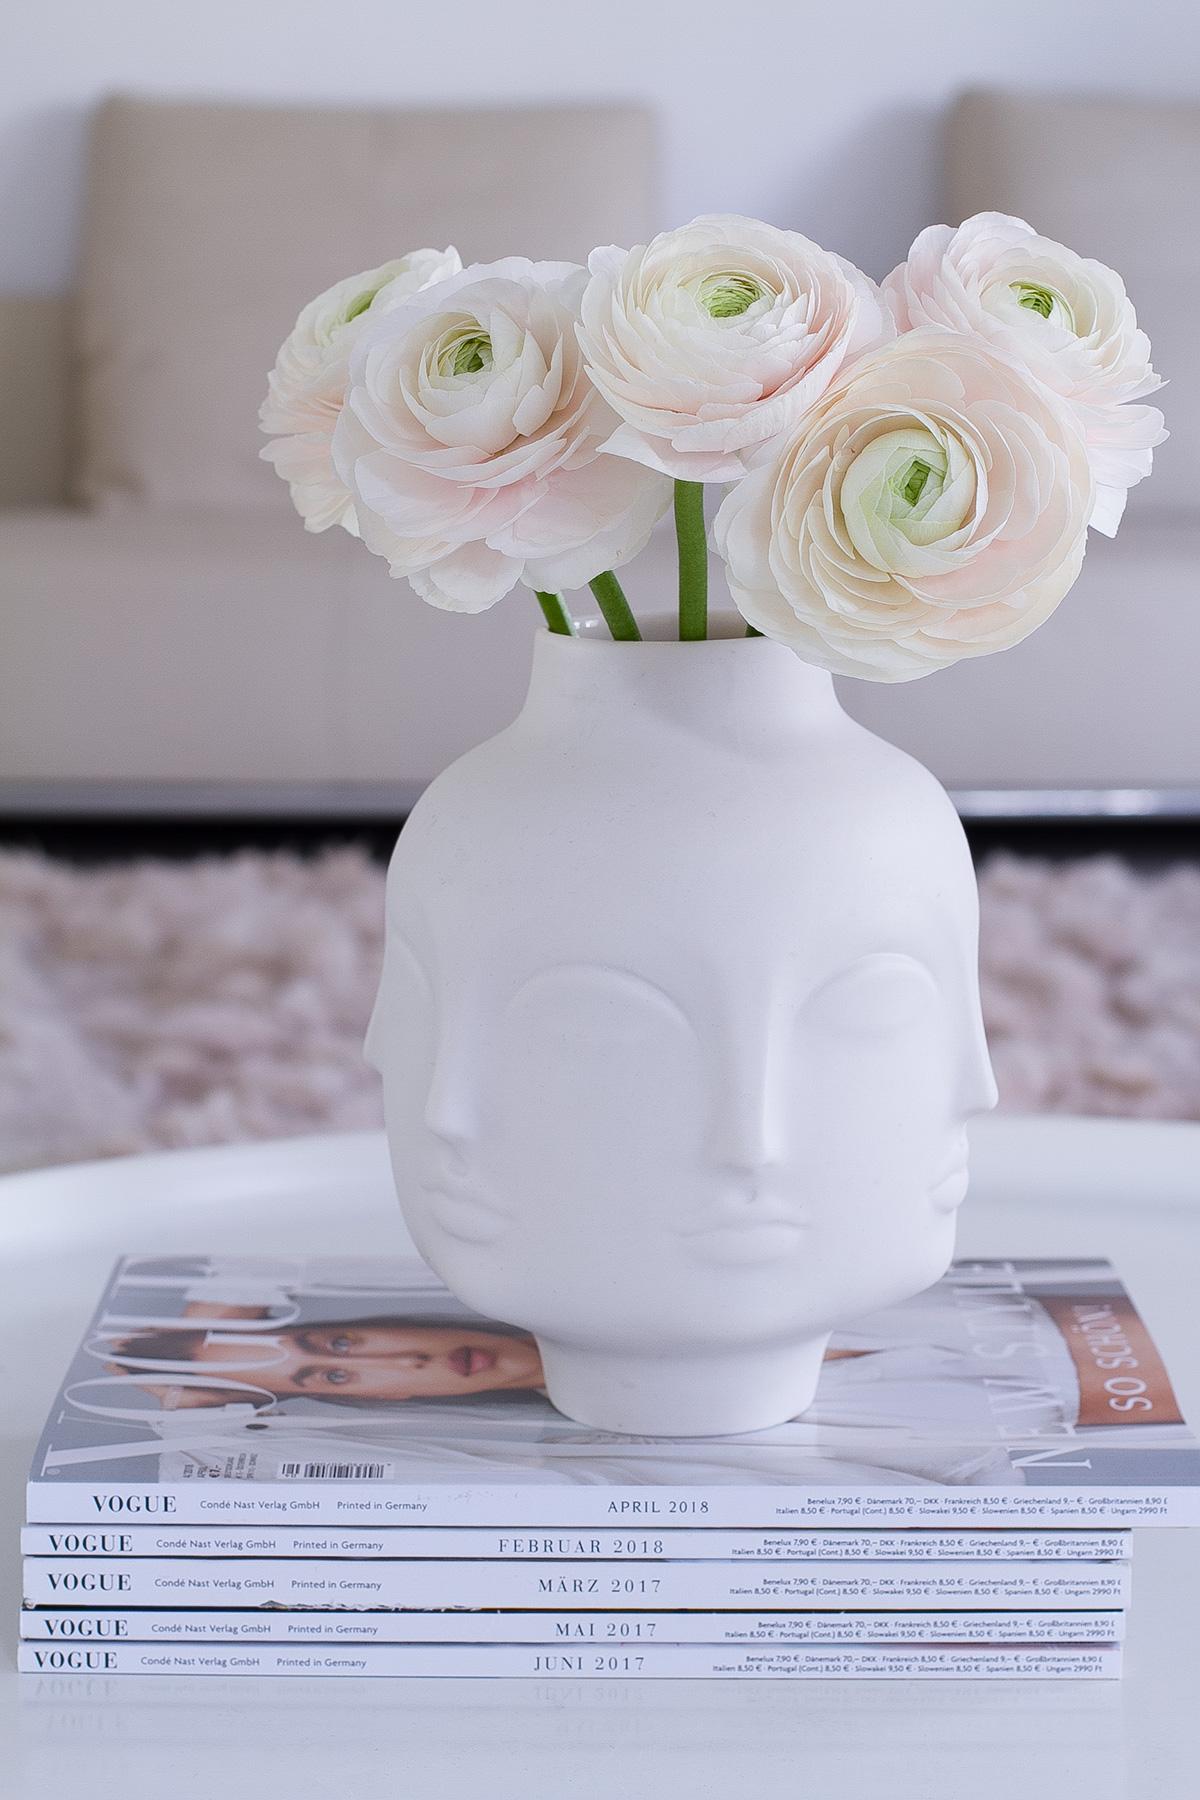 pink peonies in white Jonathan Adler porcelain Dora Maar vase, spring flowers, Vogue magazines, blogpost Lifetimepieces.com